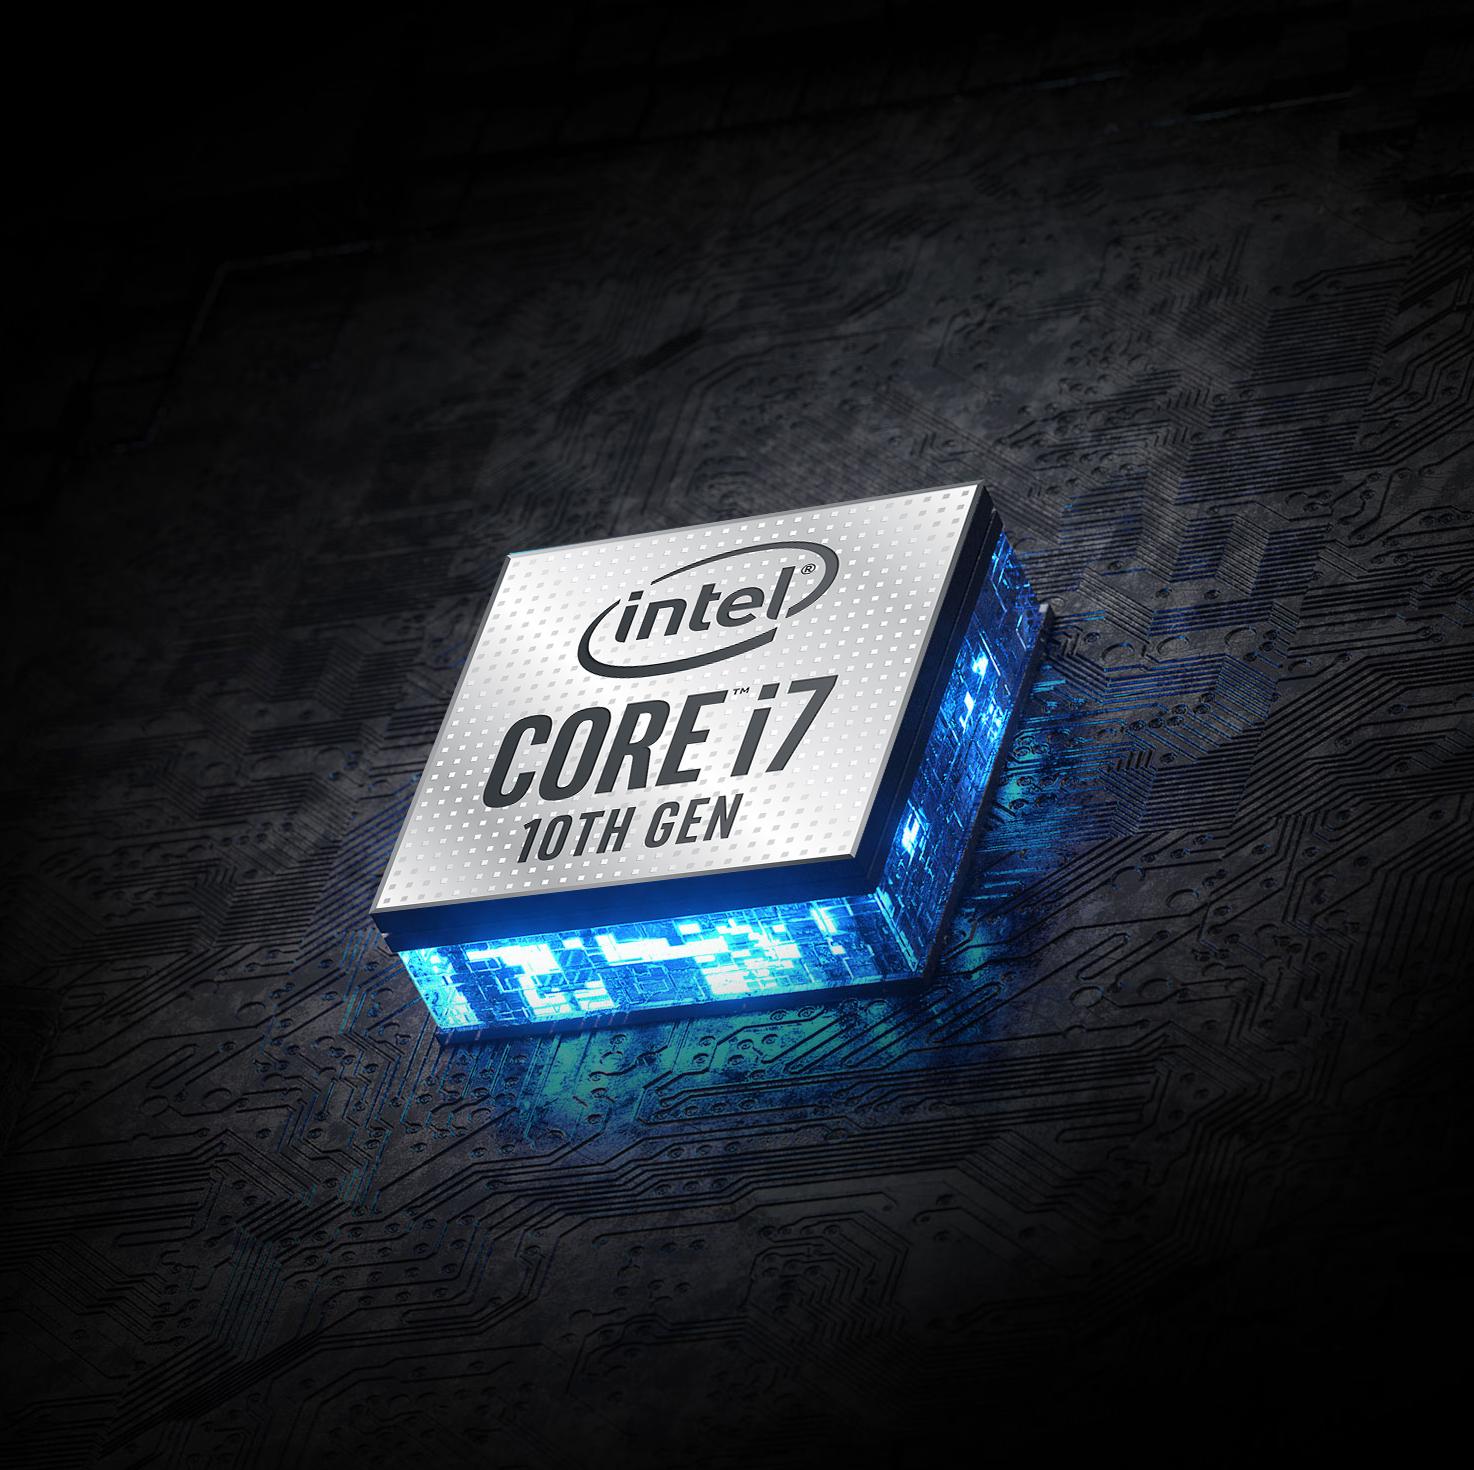 intel core i7 10th